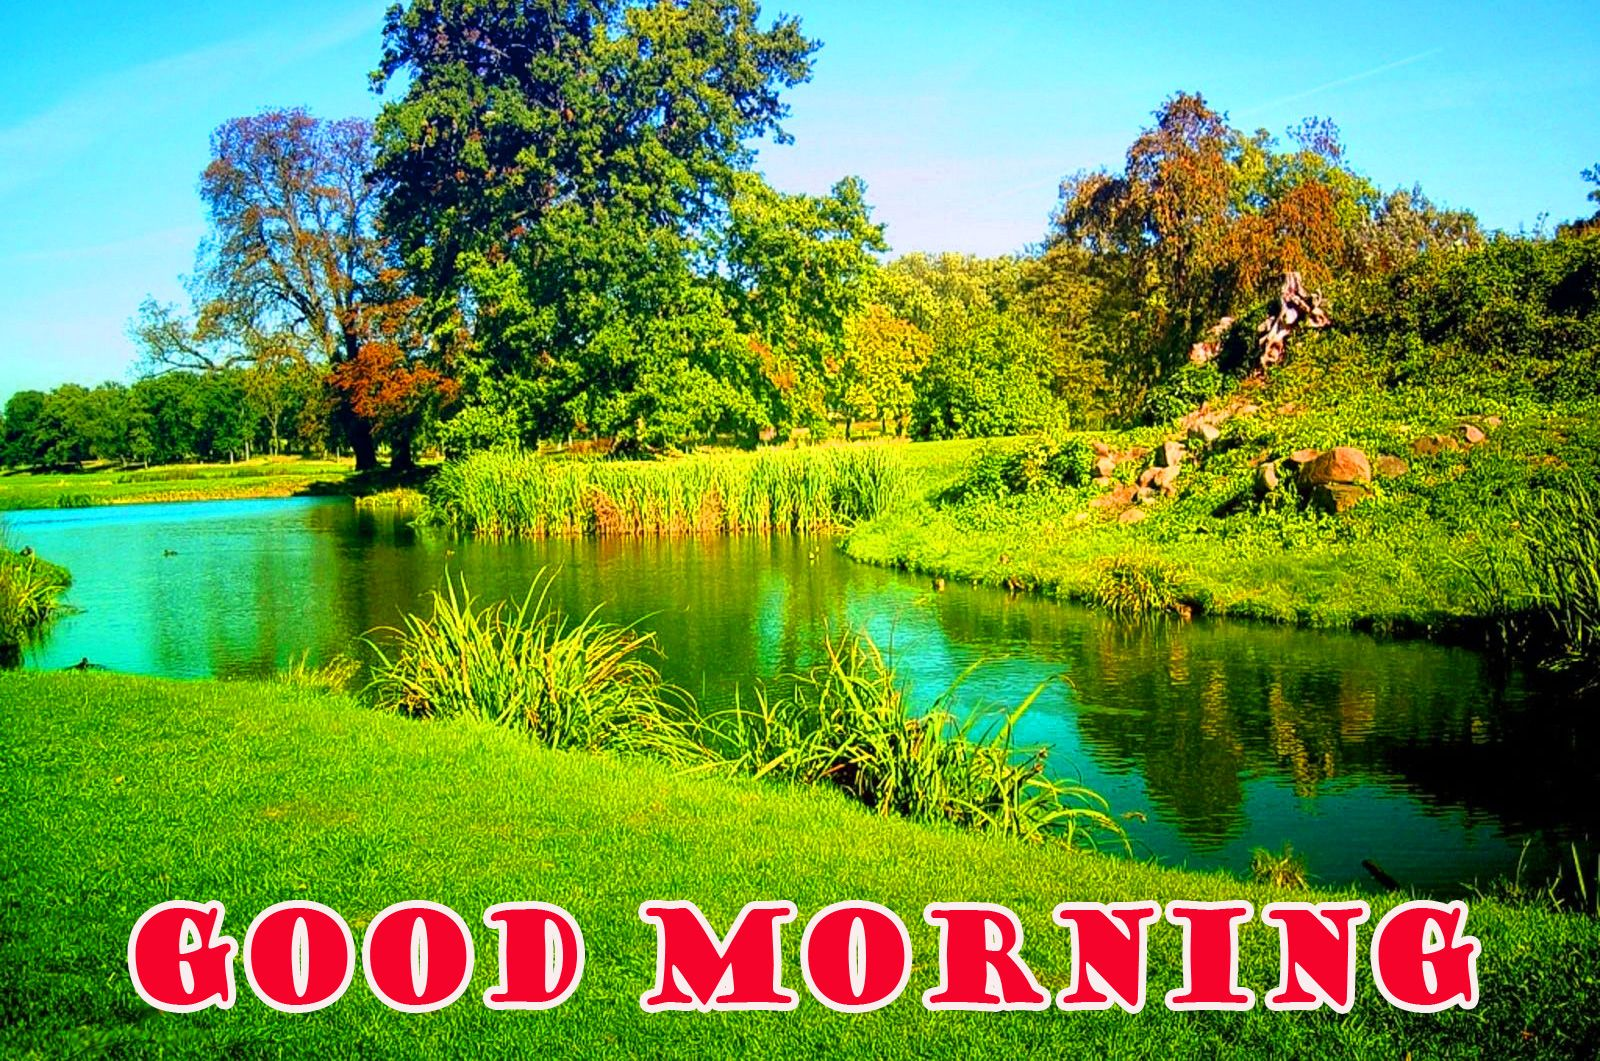 Good Morning Nature Wallpapers Top Free Good Morning Nature Backgrounds Wallpaperaccess